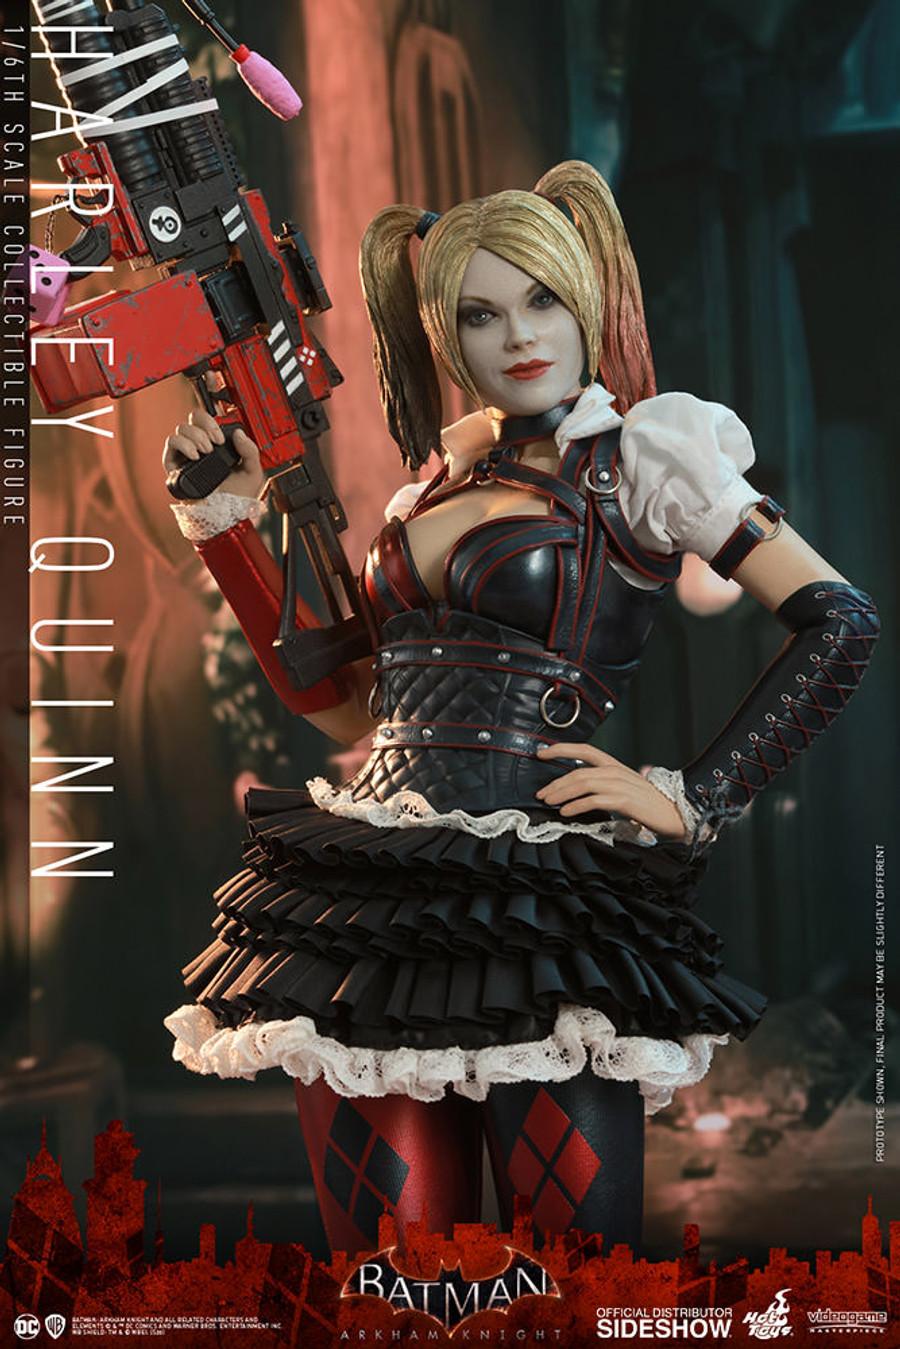 Hot Toys - Batman Arkham Knight - Harley Quinn